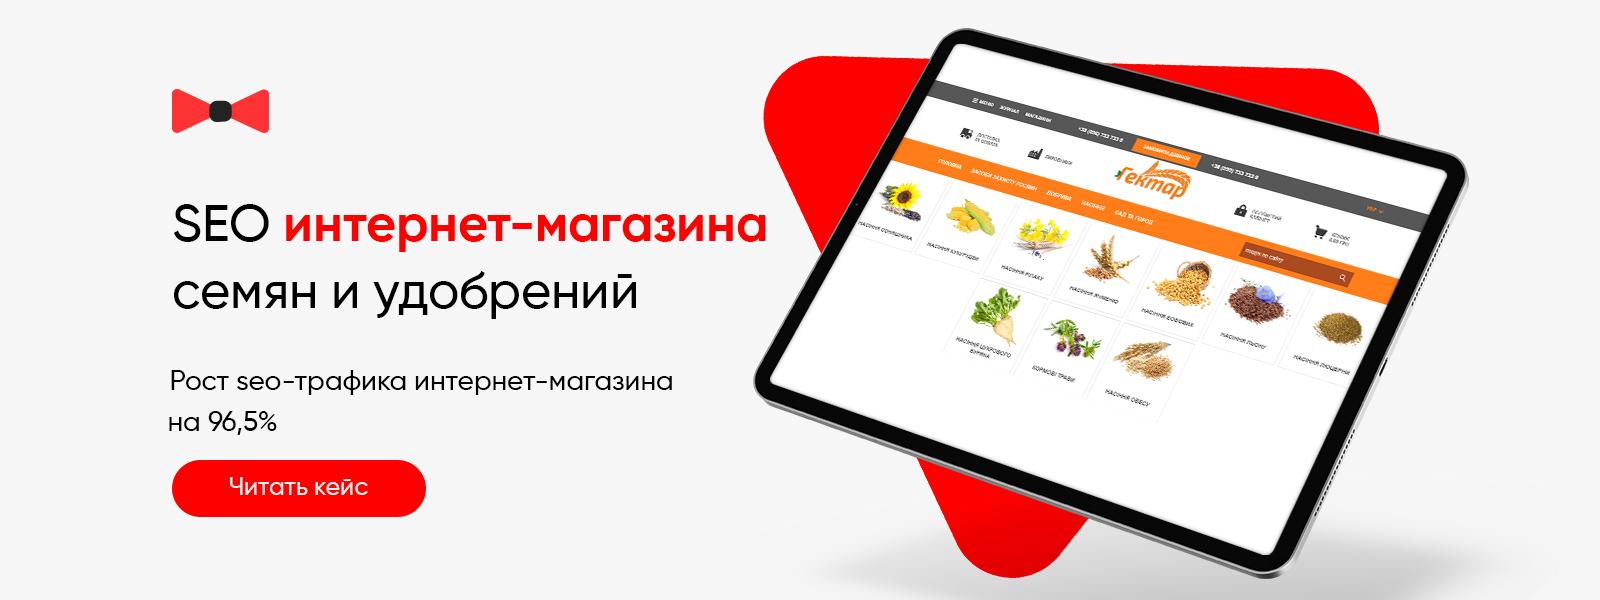 Кейс по продвижению интернет-магазина семян